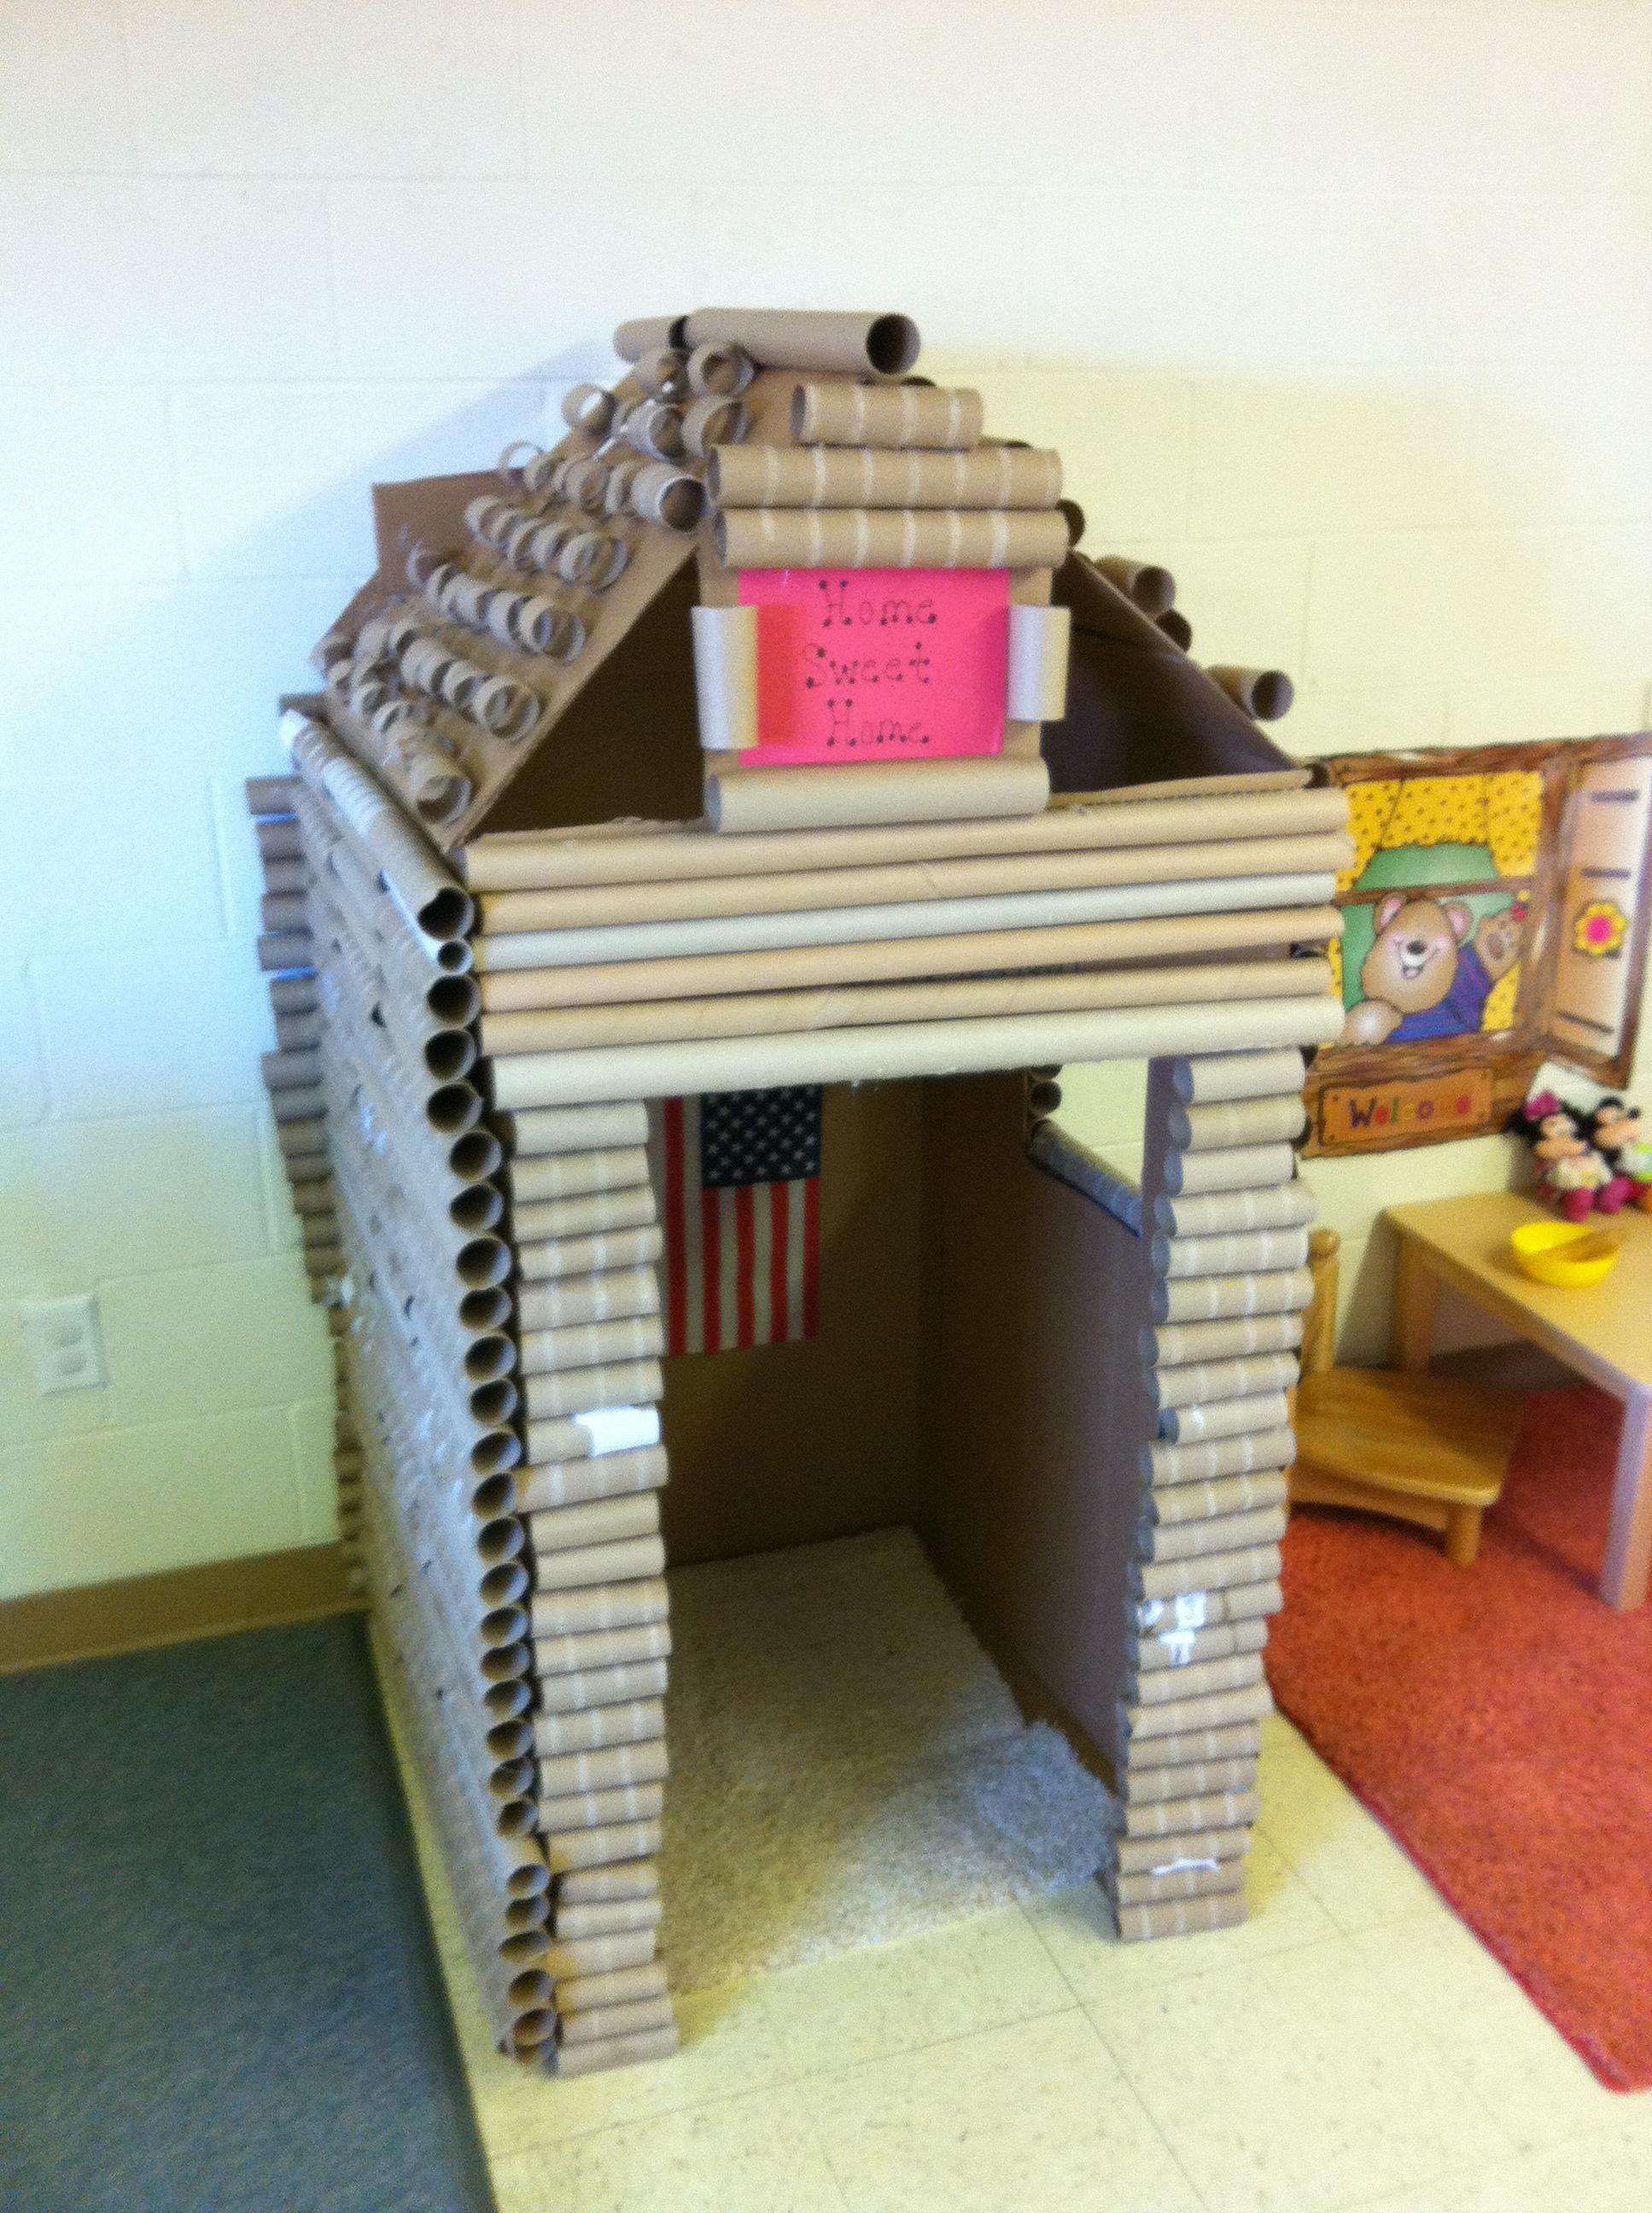 Cardboard Box And Paper Towel Gift Wrap Tube Log Cabin Craigslistdad